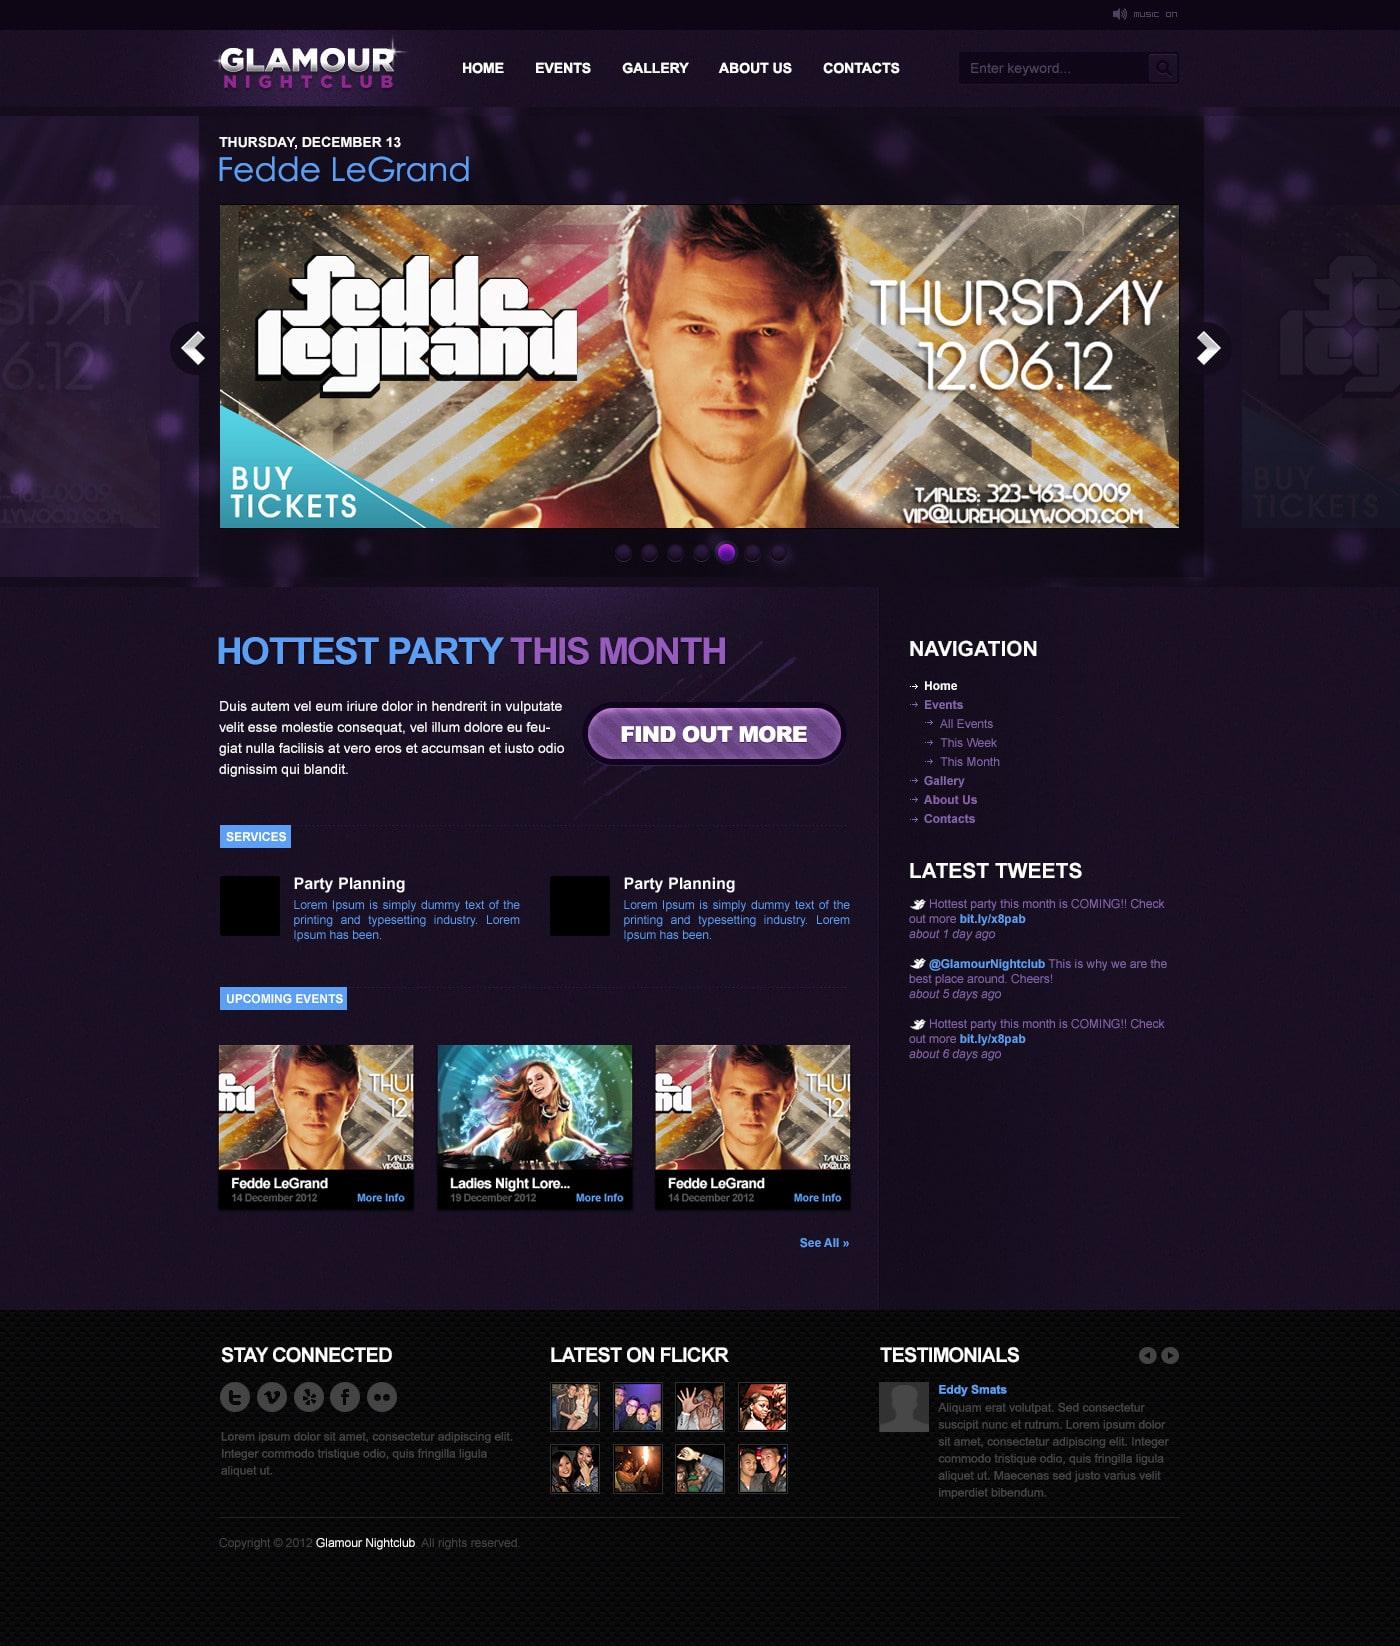 Glamour Nightclub - WordPress Theme 5